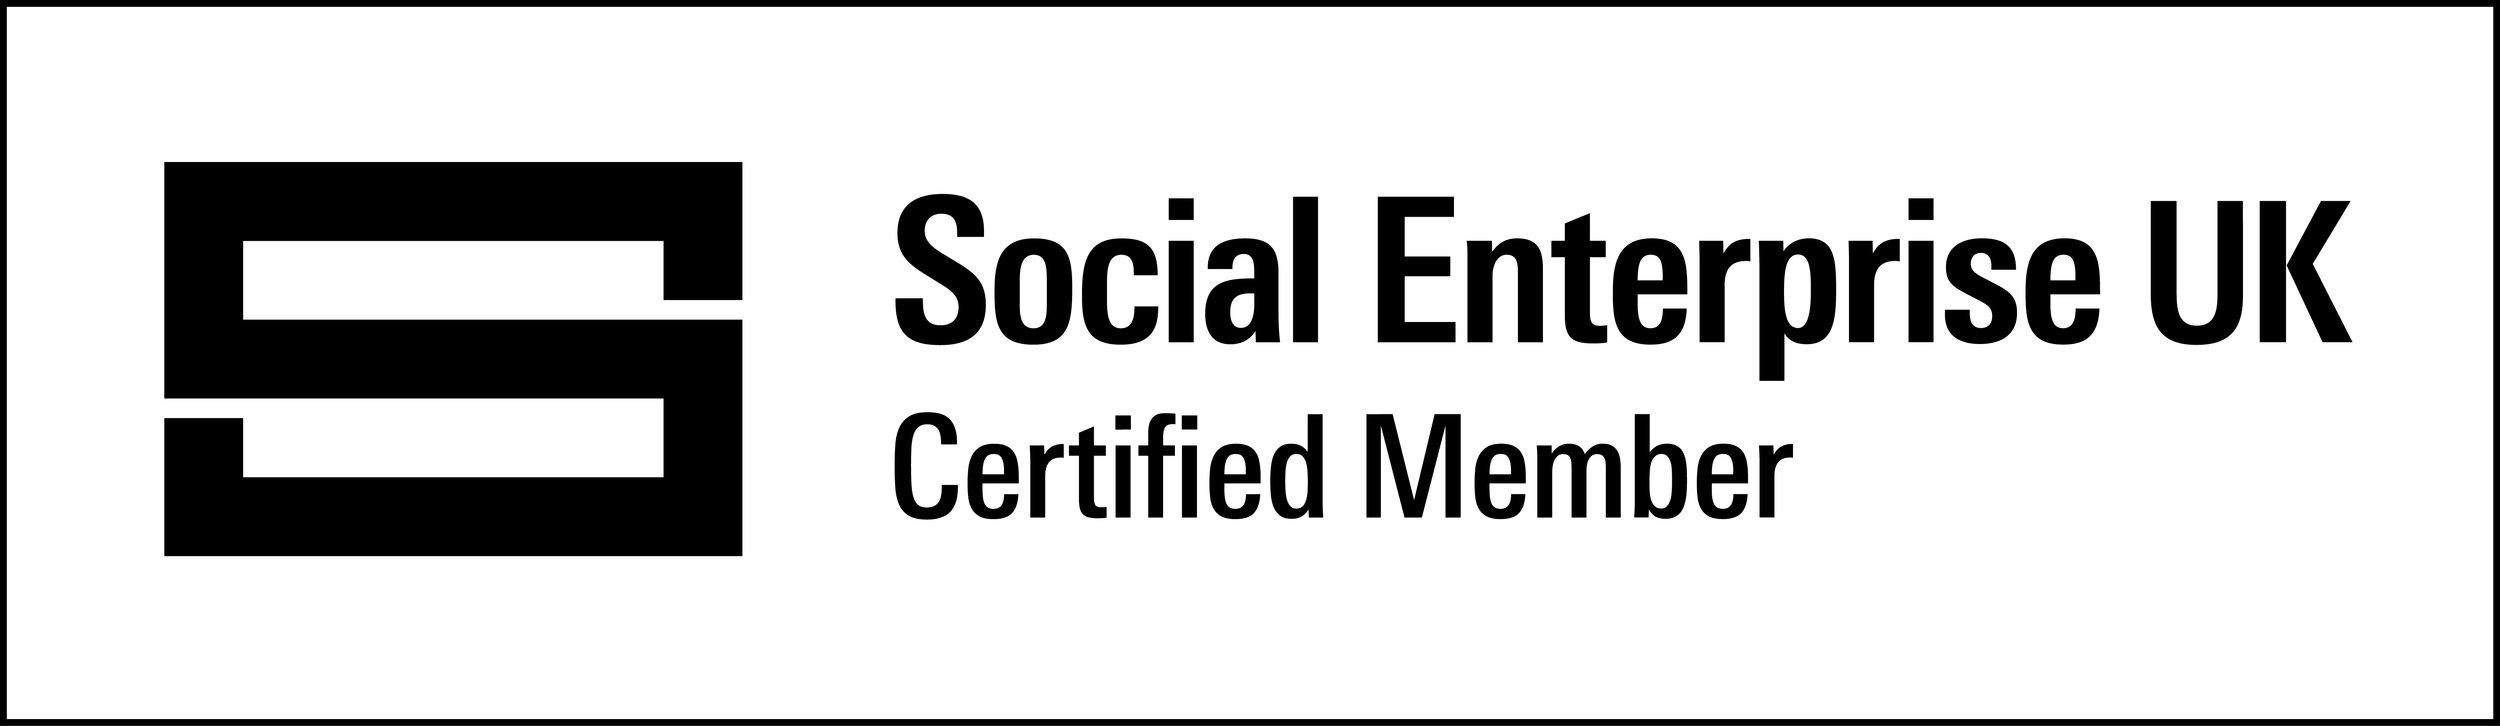 Certified Social Enterprise Badge - Black.jpg